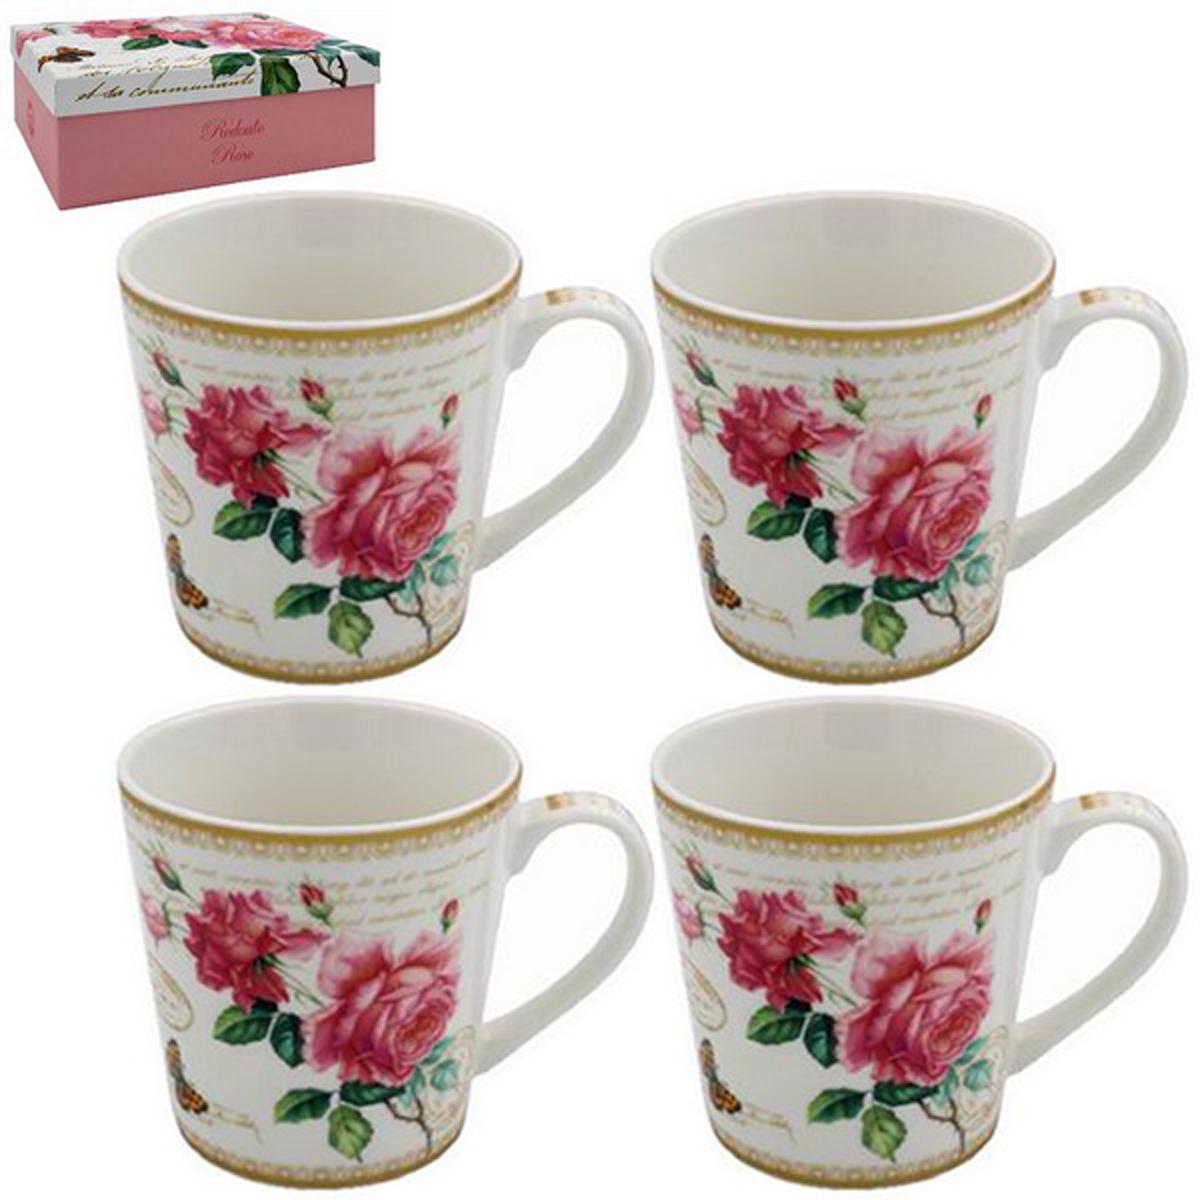 Coffret mugs porcelaine \'Redoute Rose\' rose blanc (4 mugs) - 85x85 mm  - [R2689]